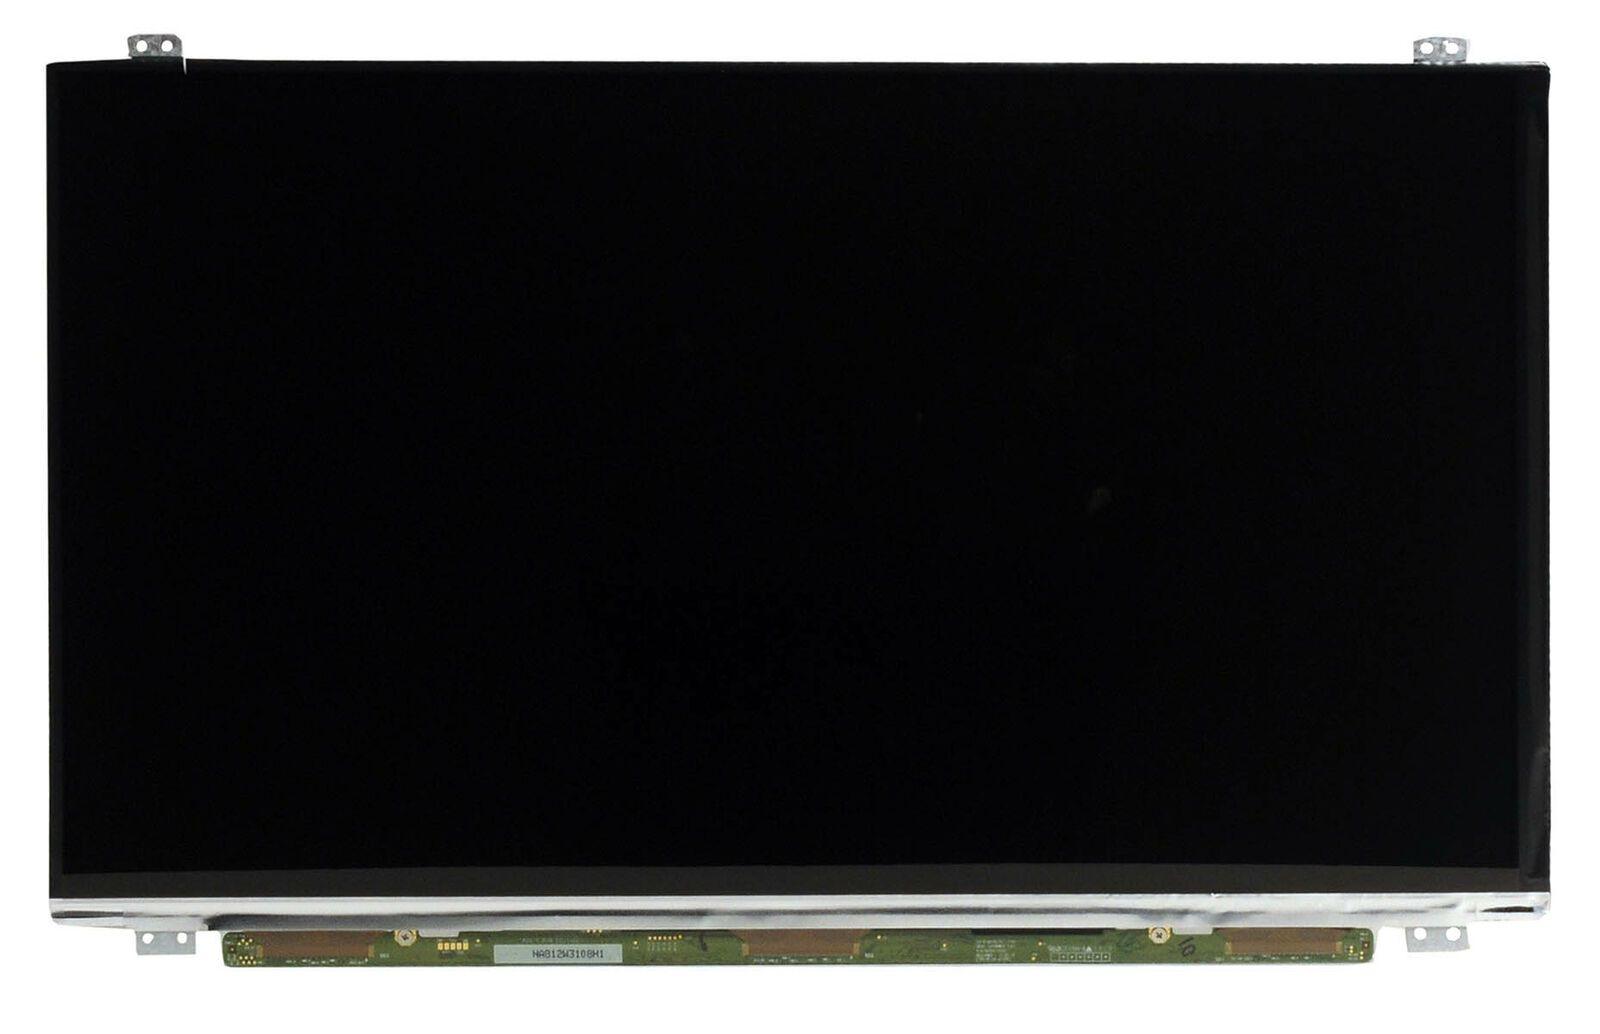 Tela 15.6 Led Slim Para Sony Vaio Sony Vaio Sve151d11l 40 pin - EASY HELP NOTE